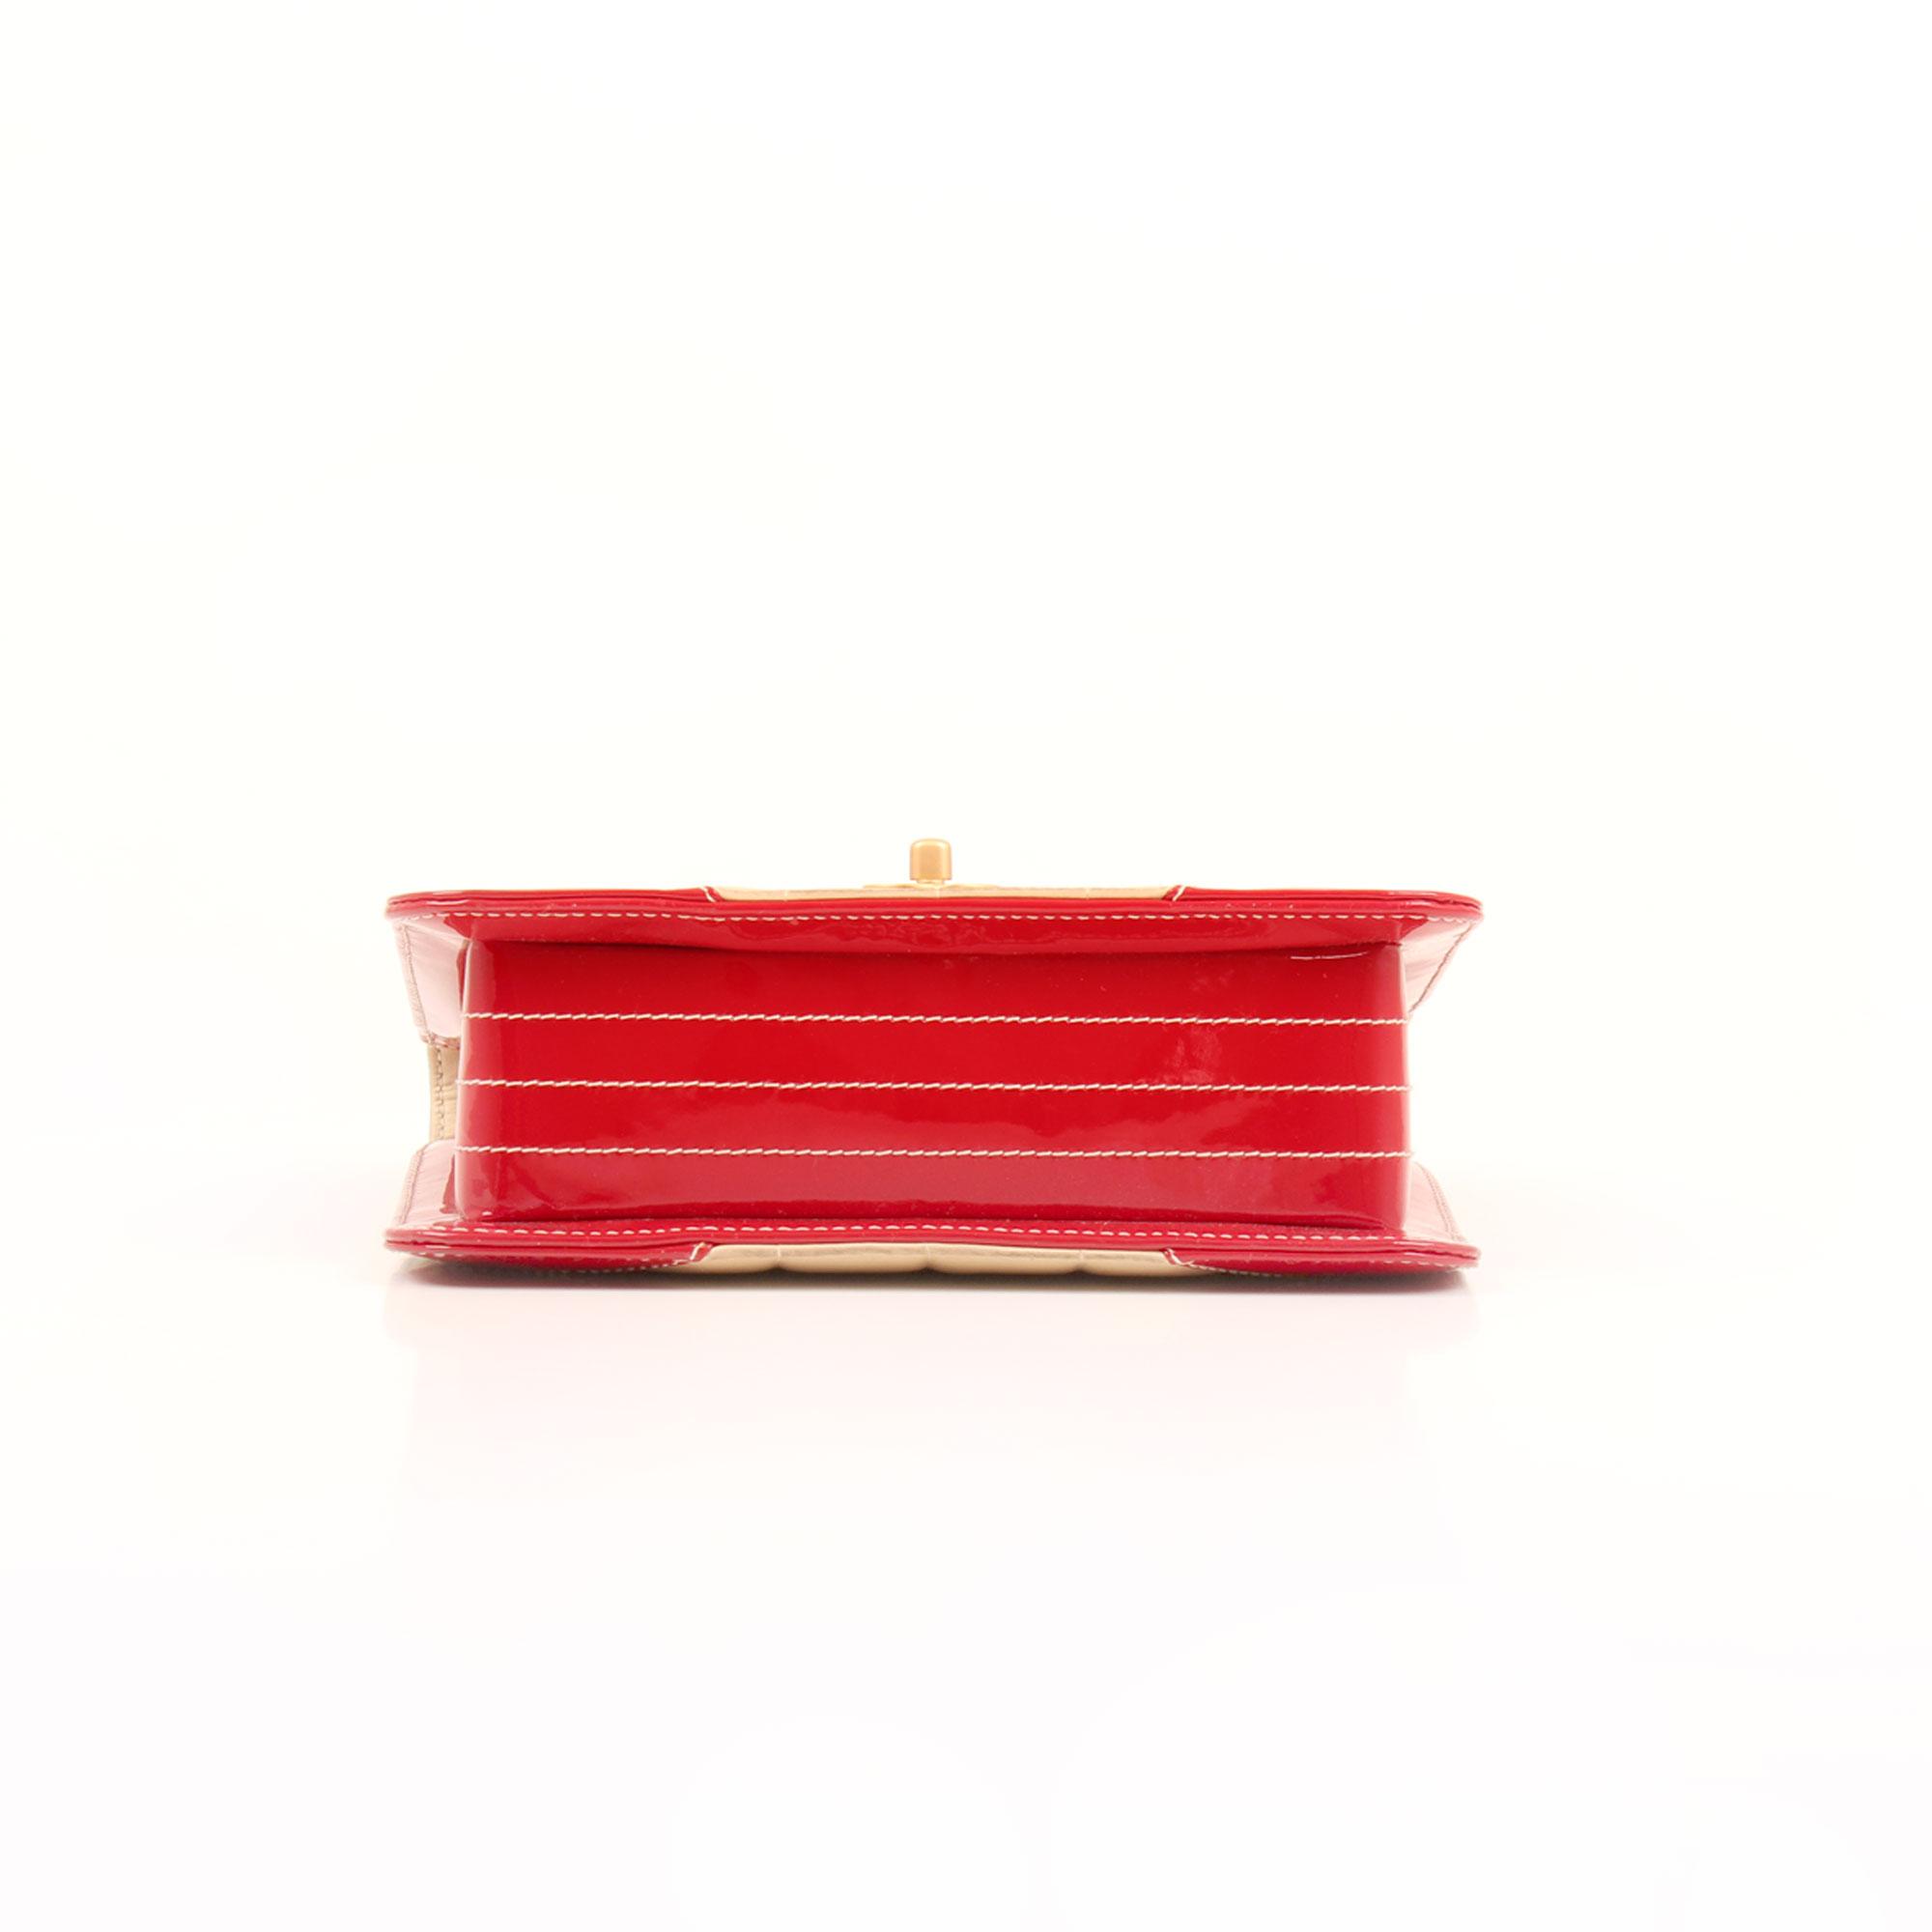 Base image of chanel bicolor choco bar single flap